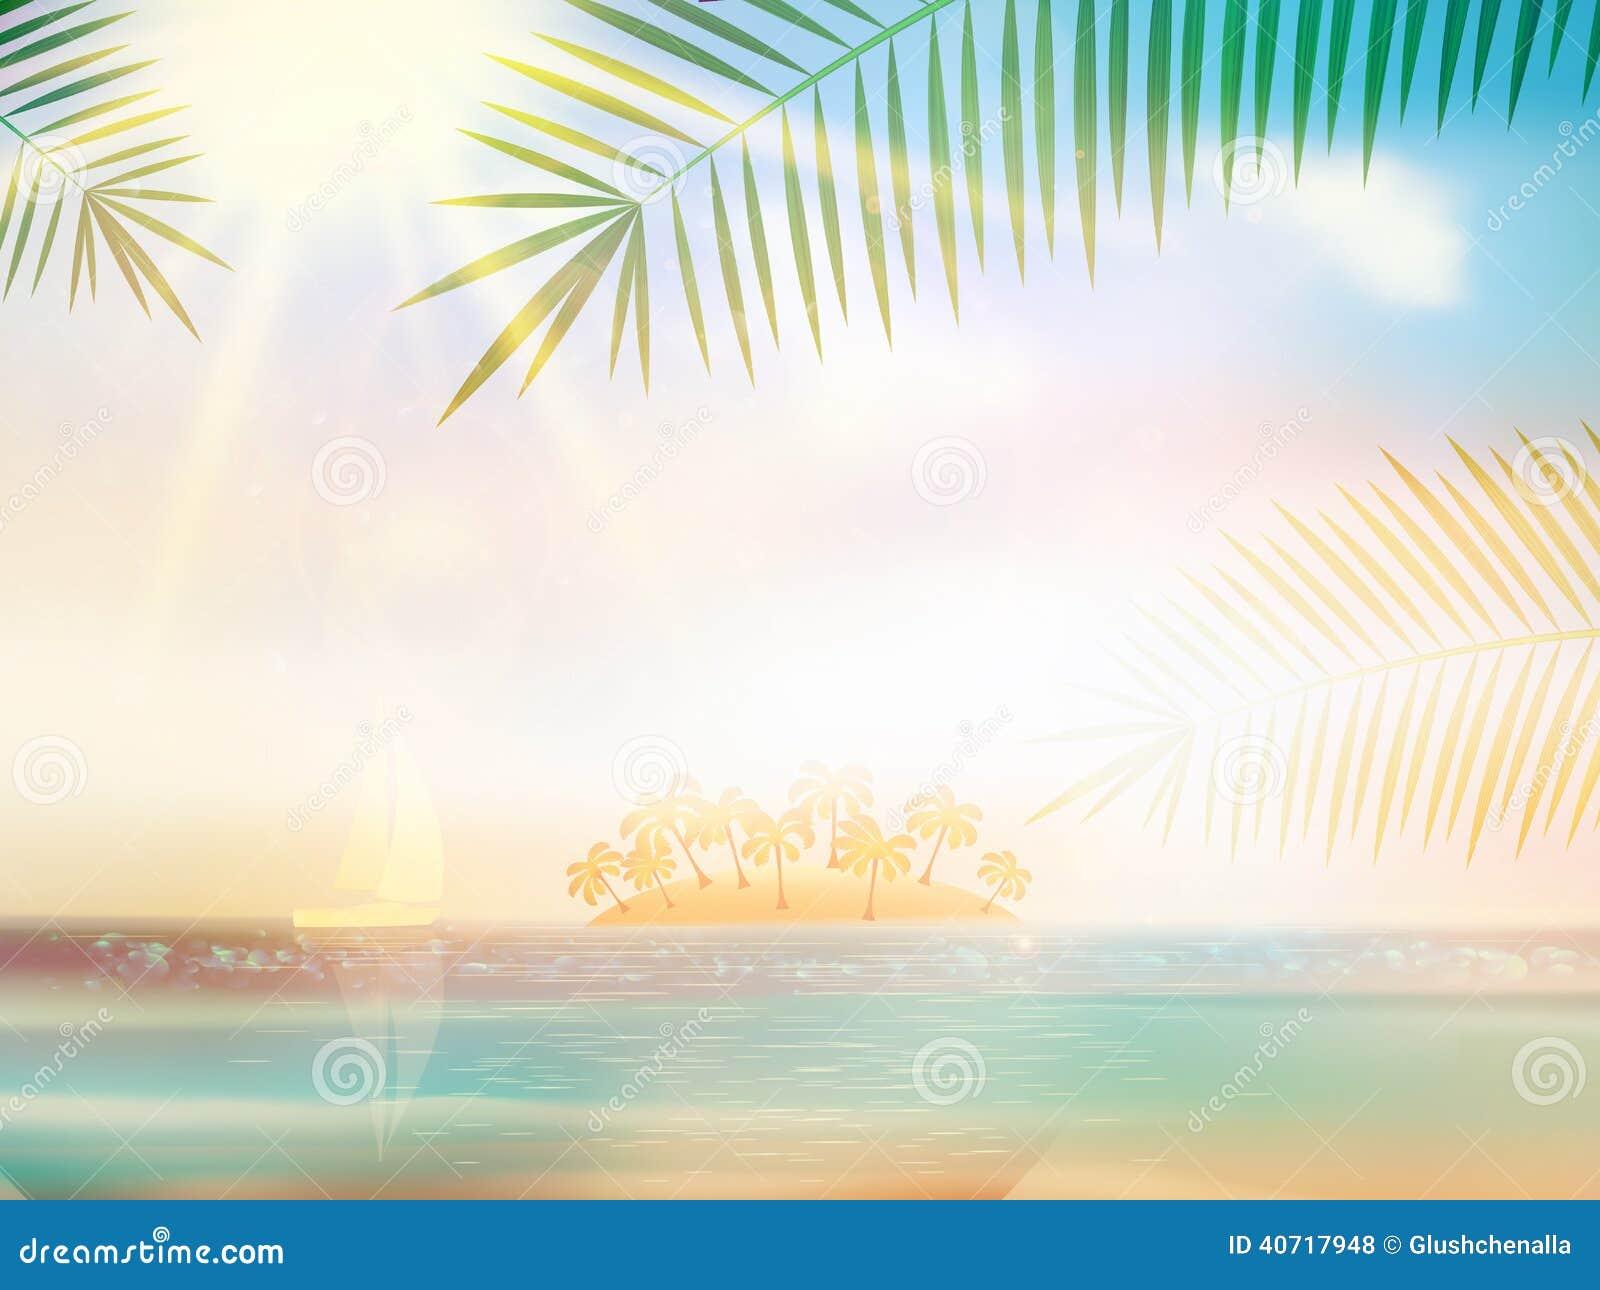 sea beach for summer design template stock vector illustration of